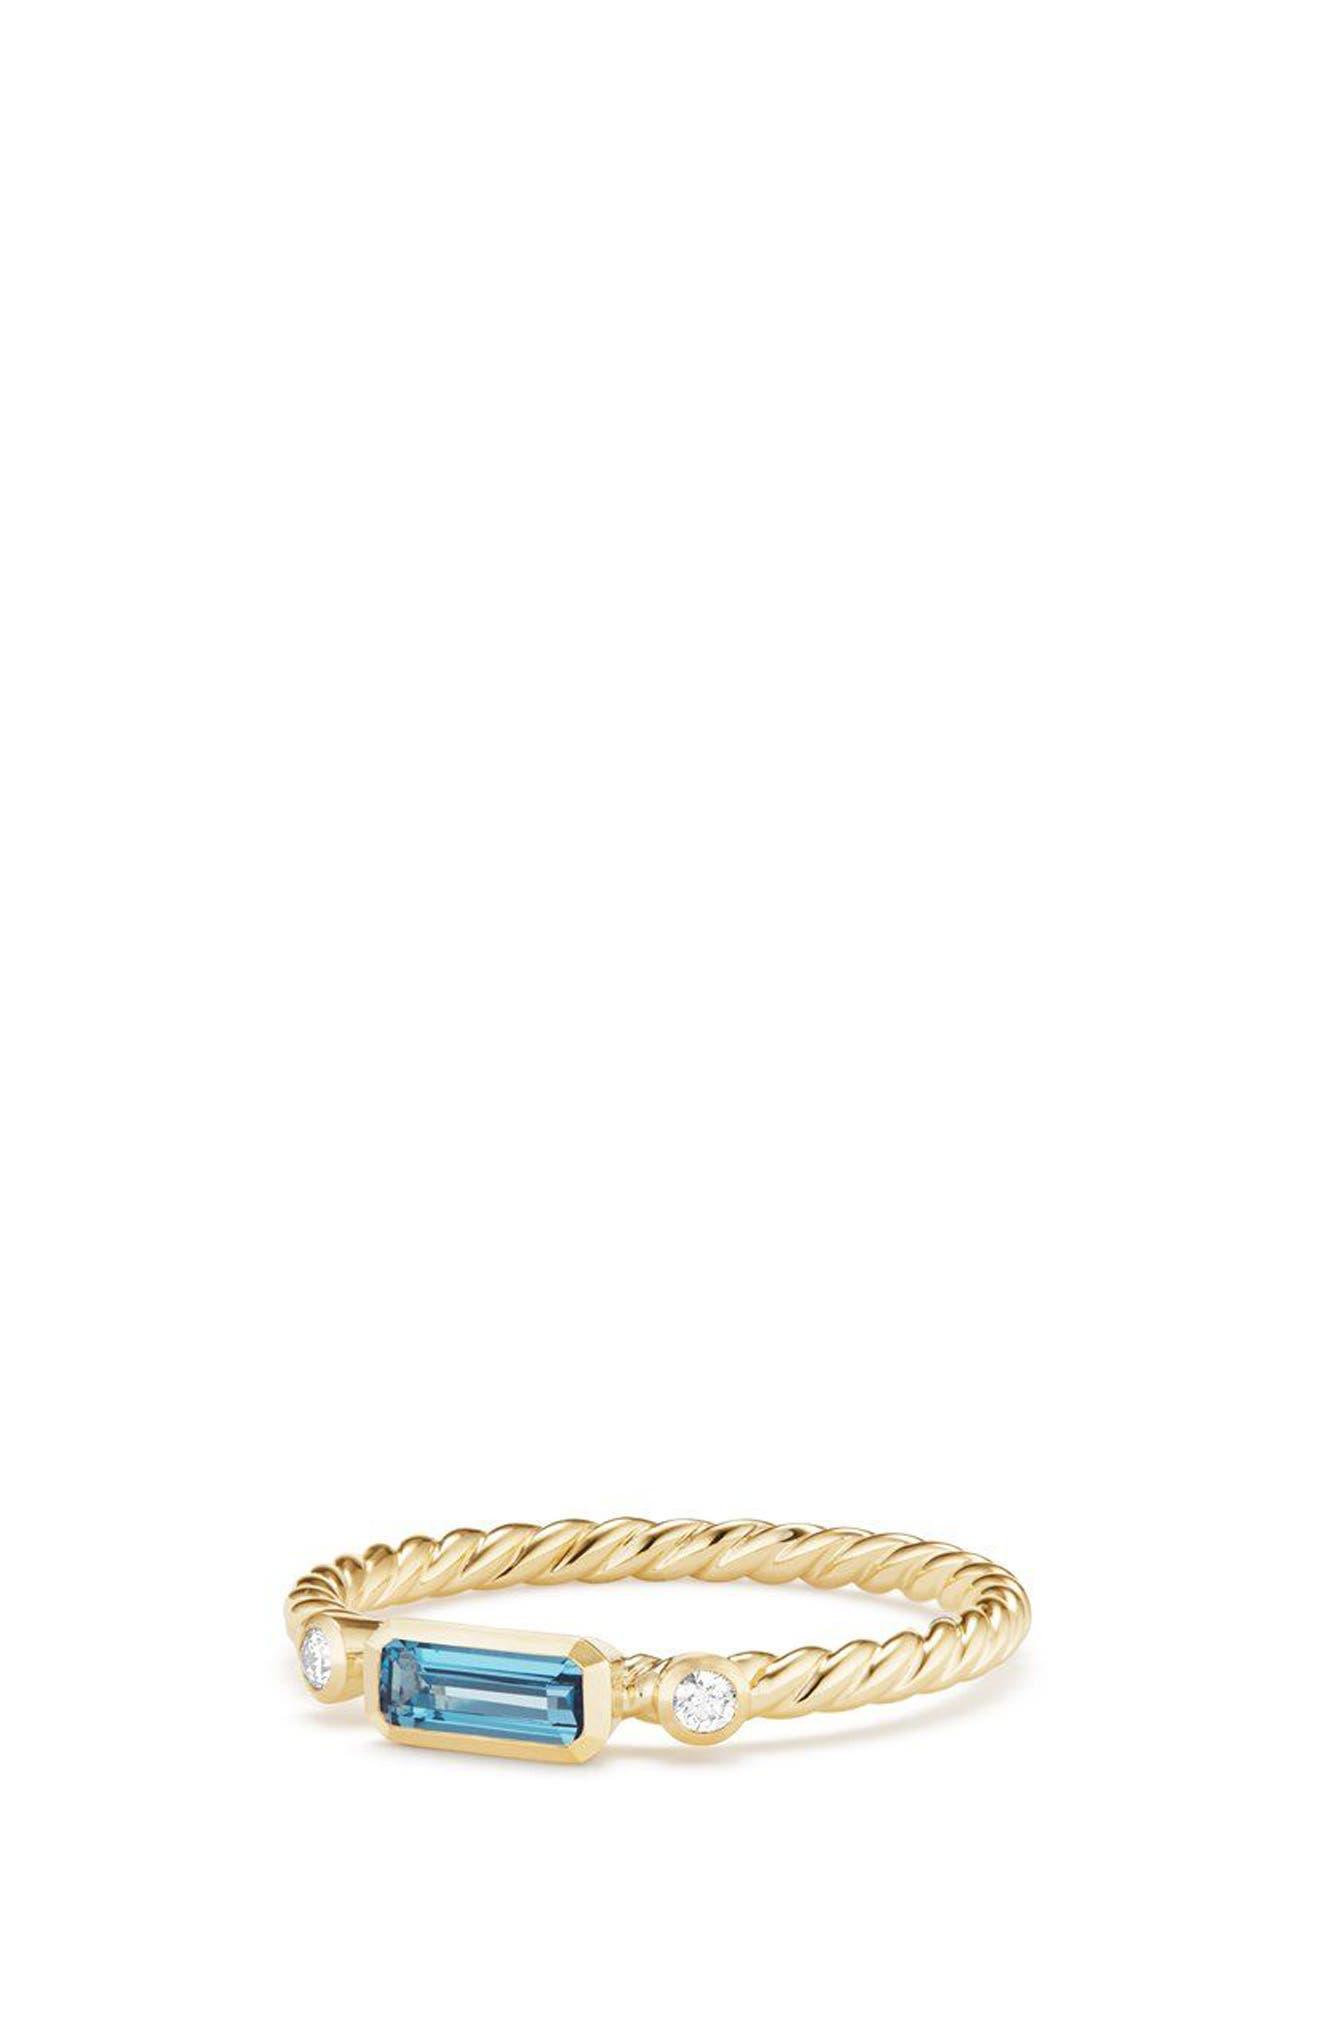 DAVID YURMAN, Novella Ring in 18K Gold, Main thumbnail 1, color, GOLD/ DIAMOND/ BLUE TOPAZ